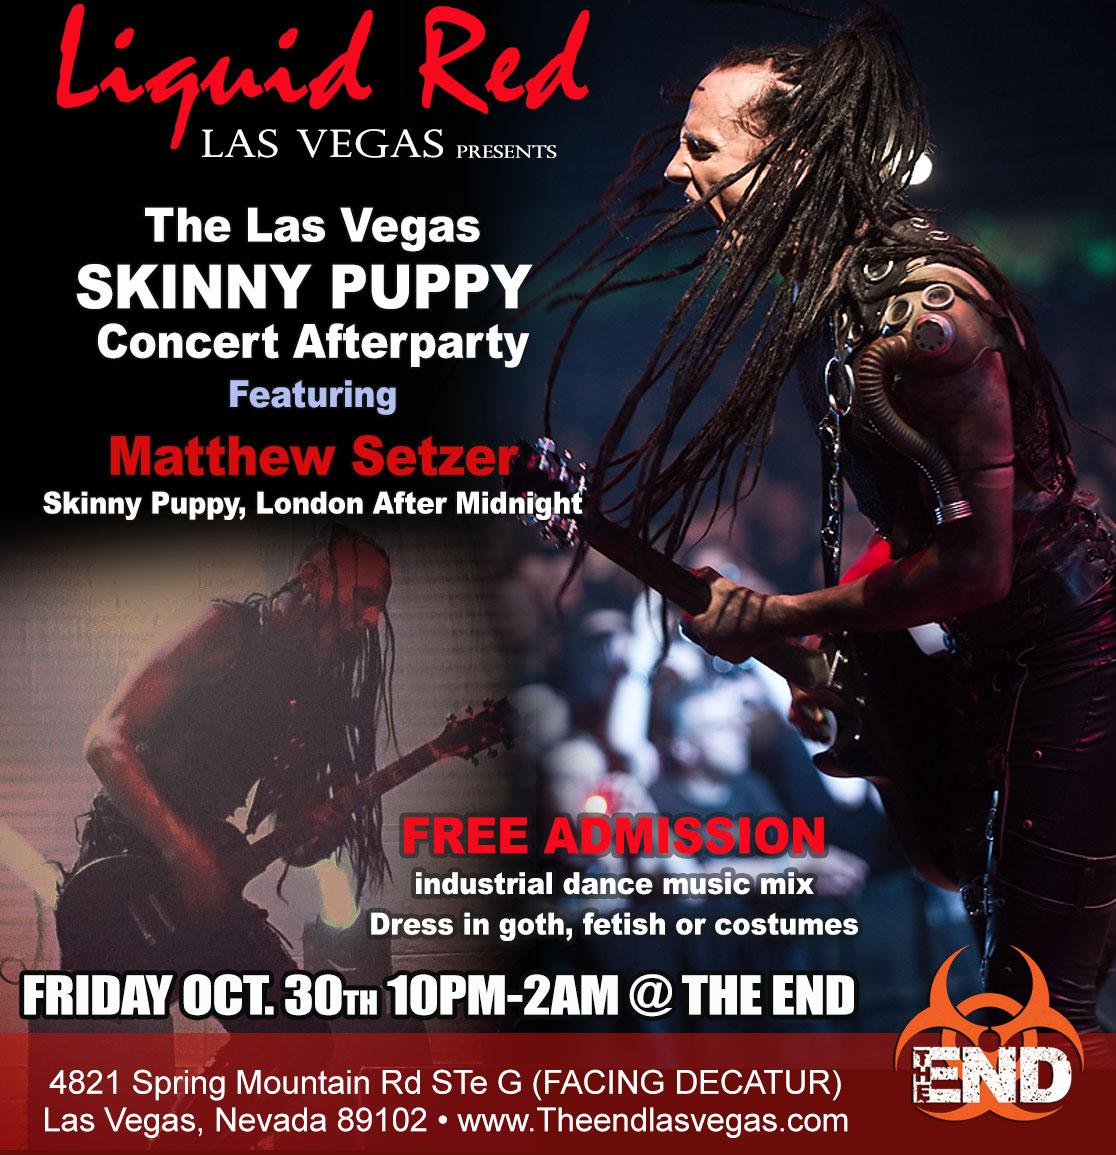 LiquidRed-skinny_puppy1a